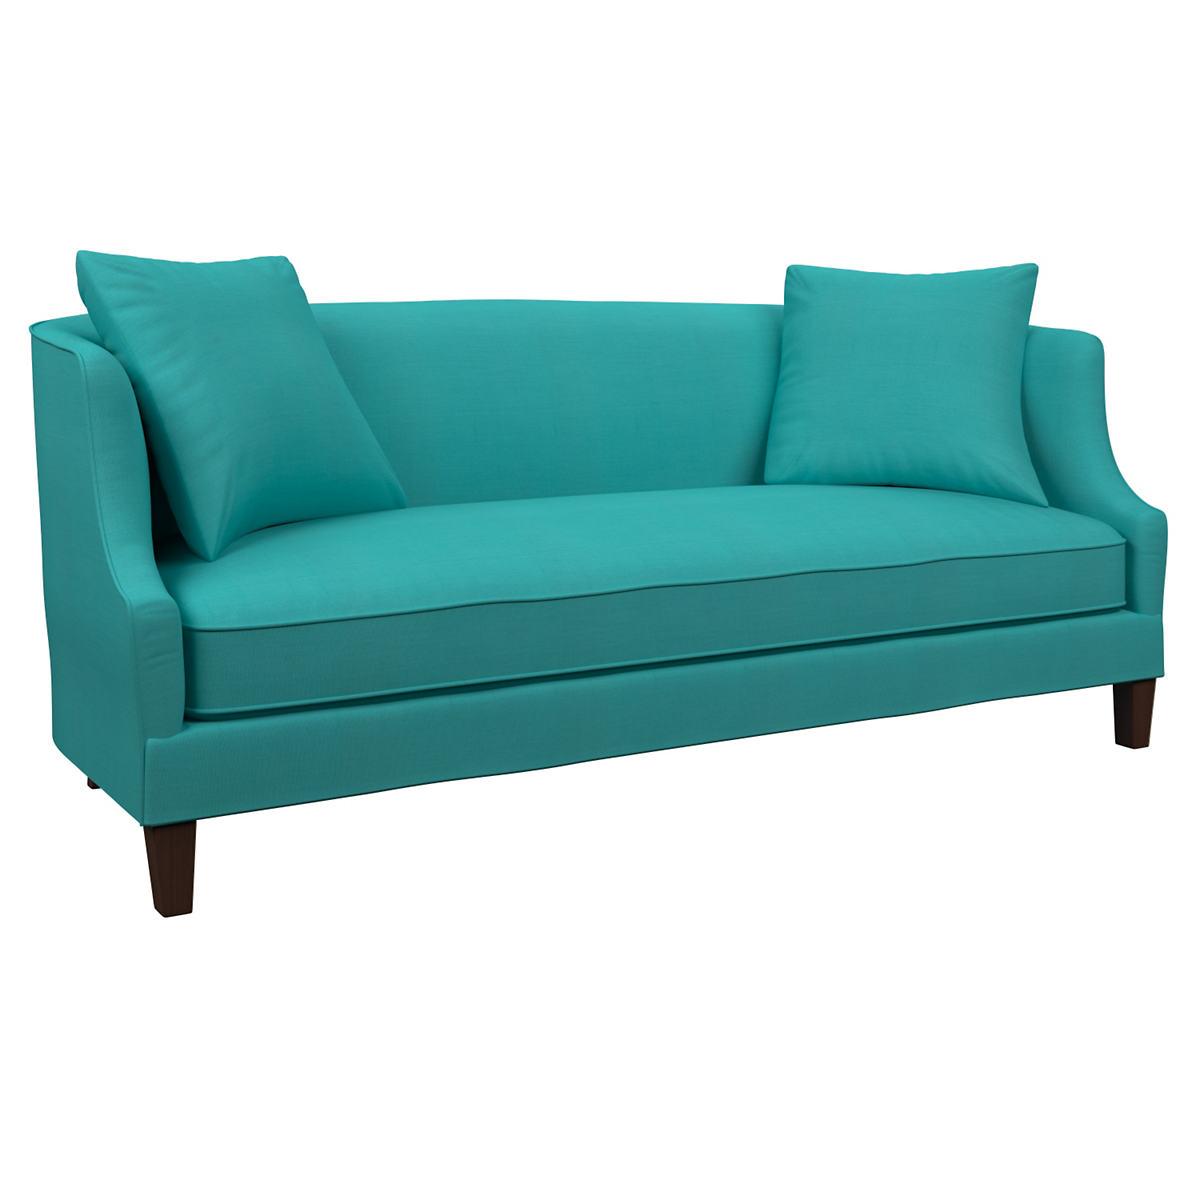 Estate Linen Turquoise Cheshire Sofa